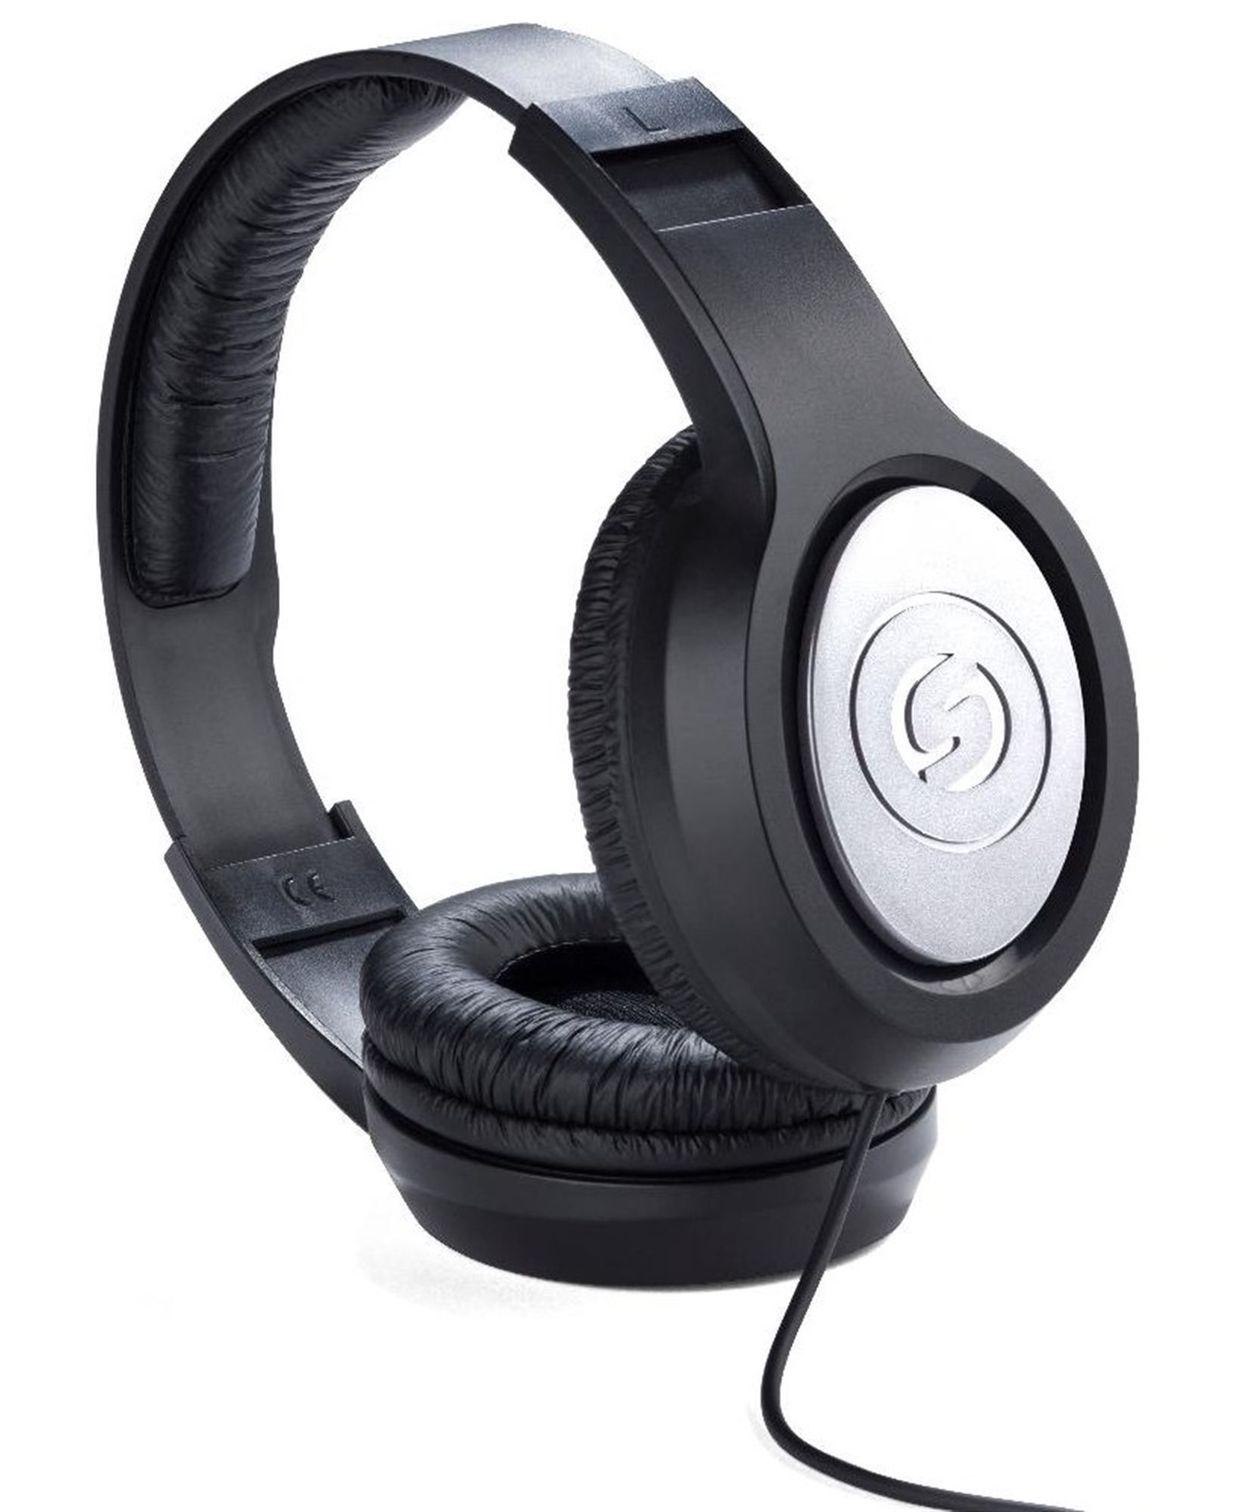 Samson SR400 Headphones